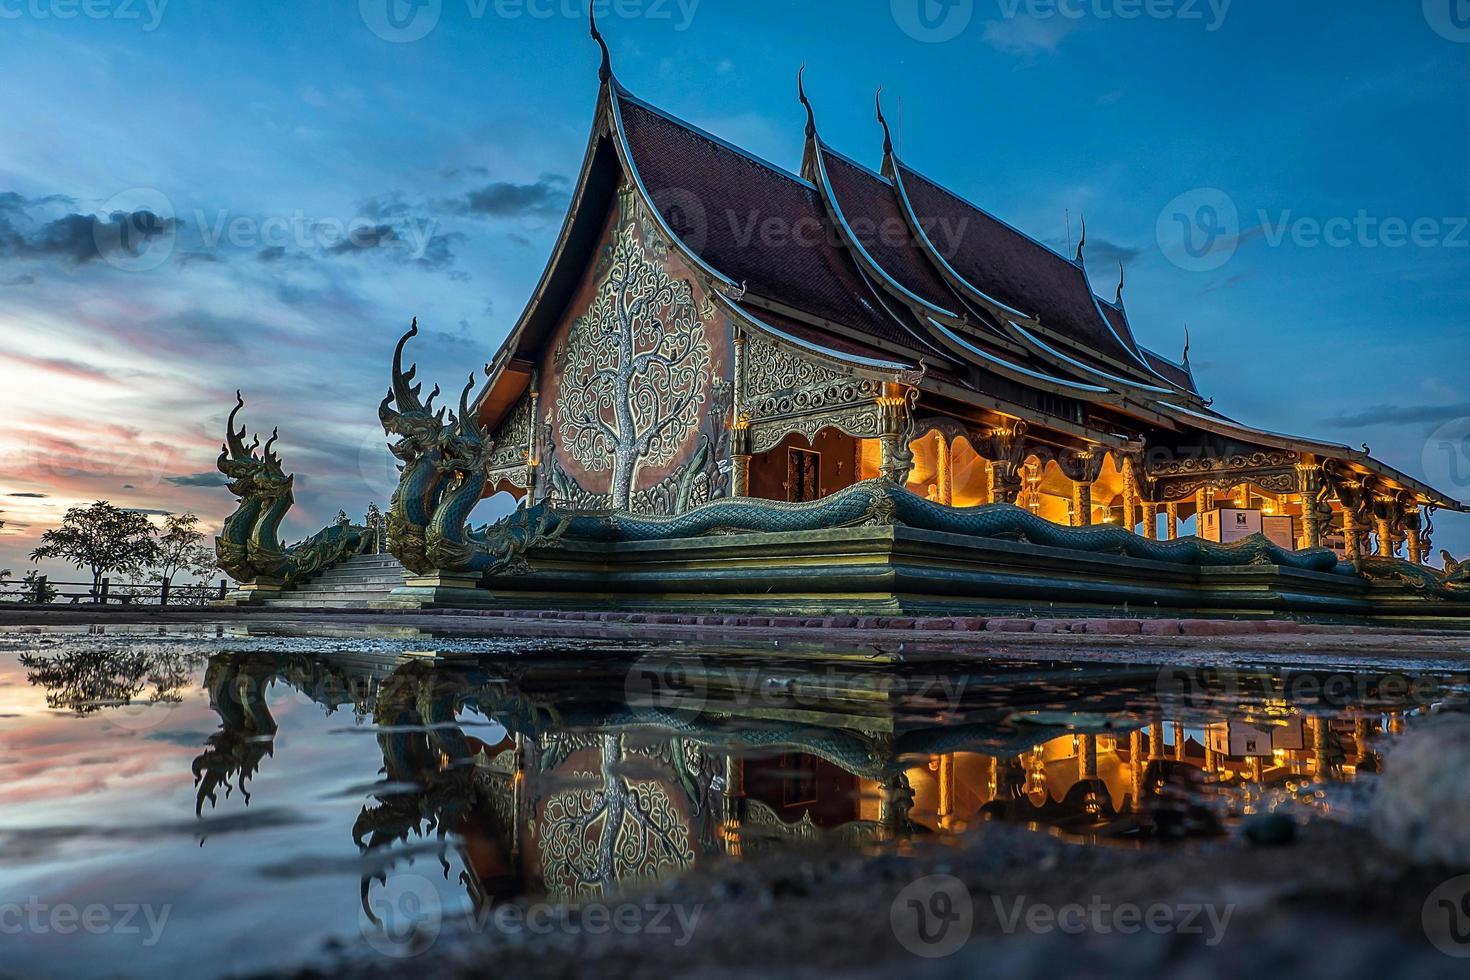 wat sirintornwararam il tempio nella provincia di ubon ratchathani, Thailandia foto